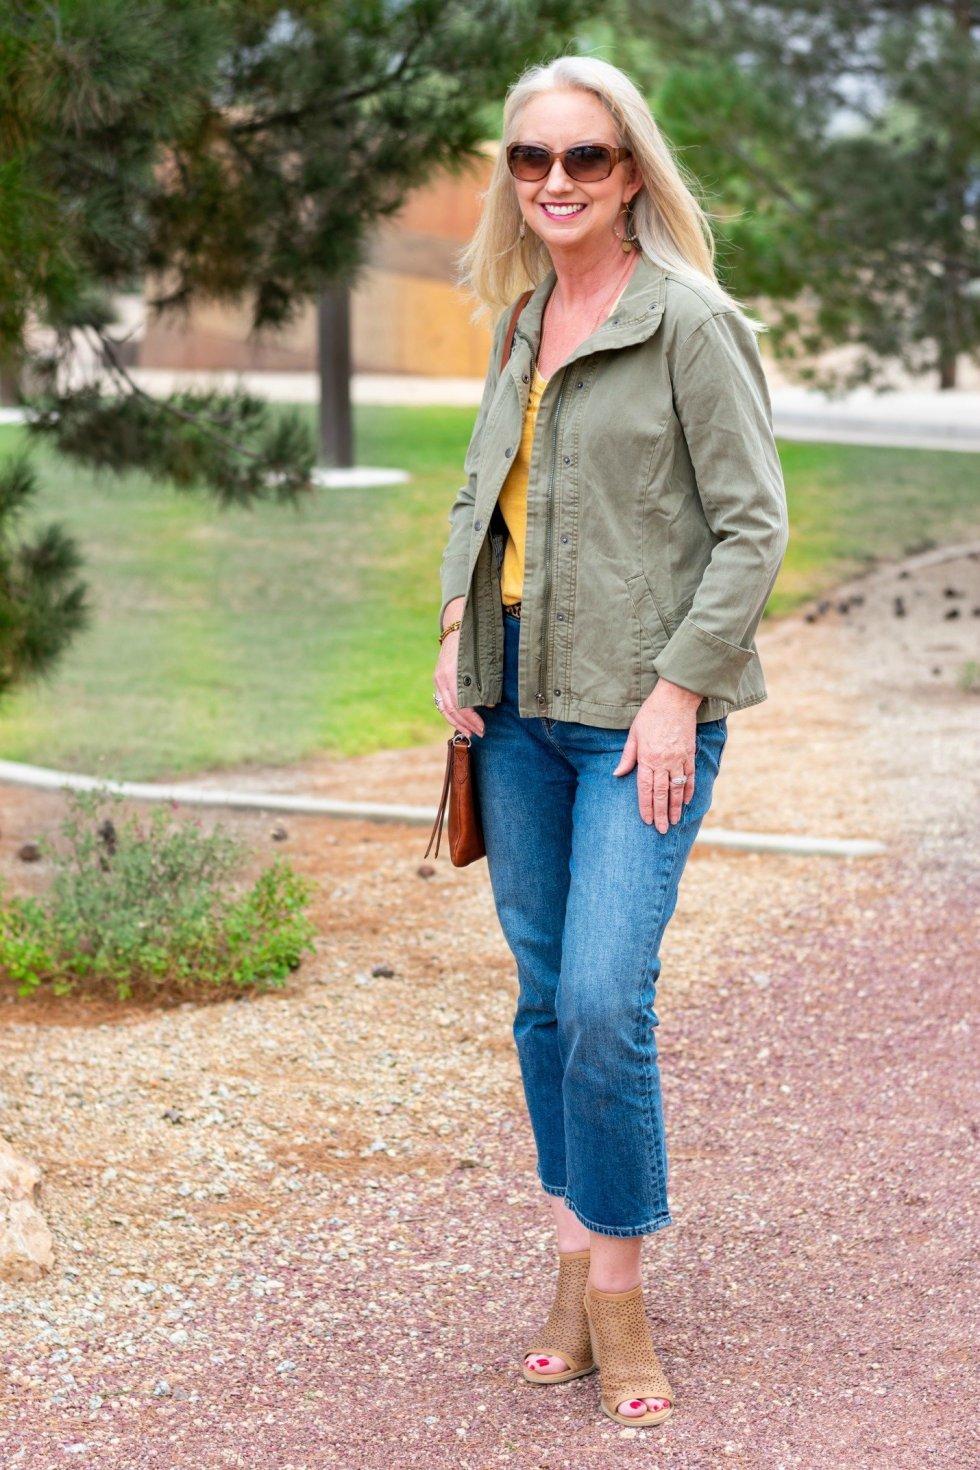 Utility Jacket Completes Fall Weekend Look